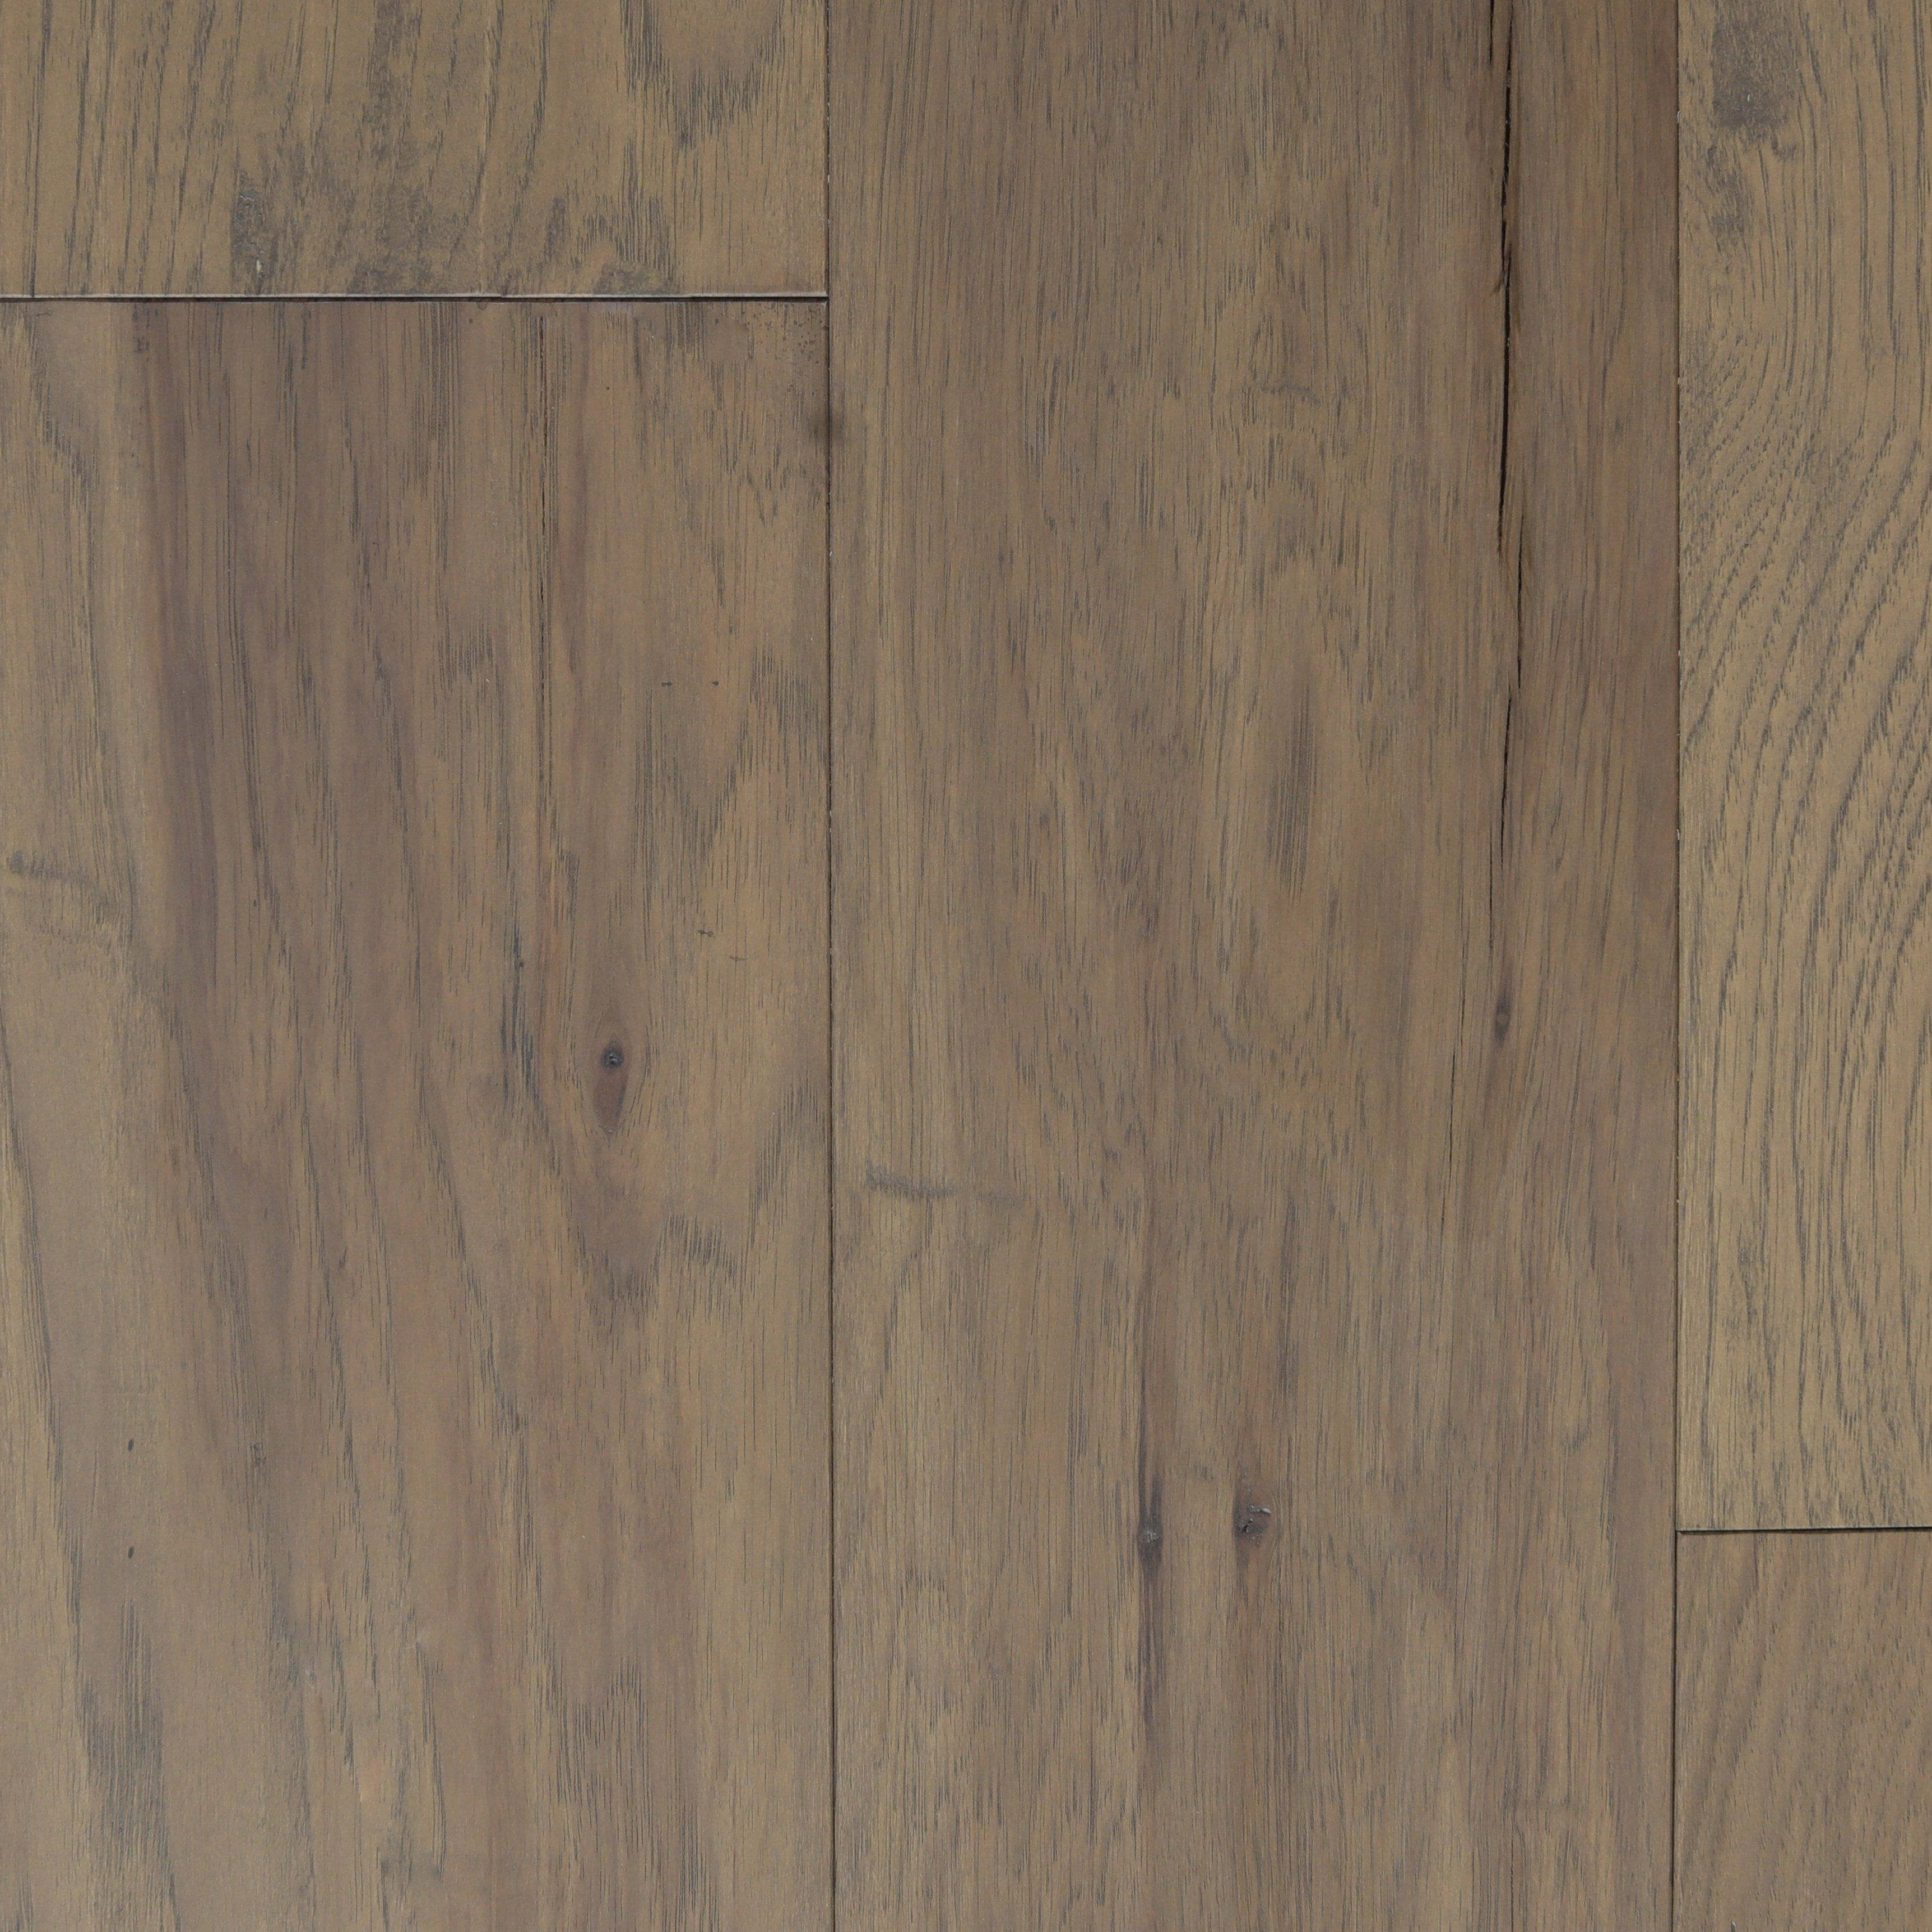 Emerald Collection Engineered Hardwood